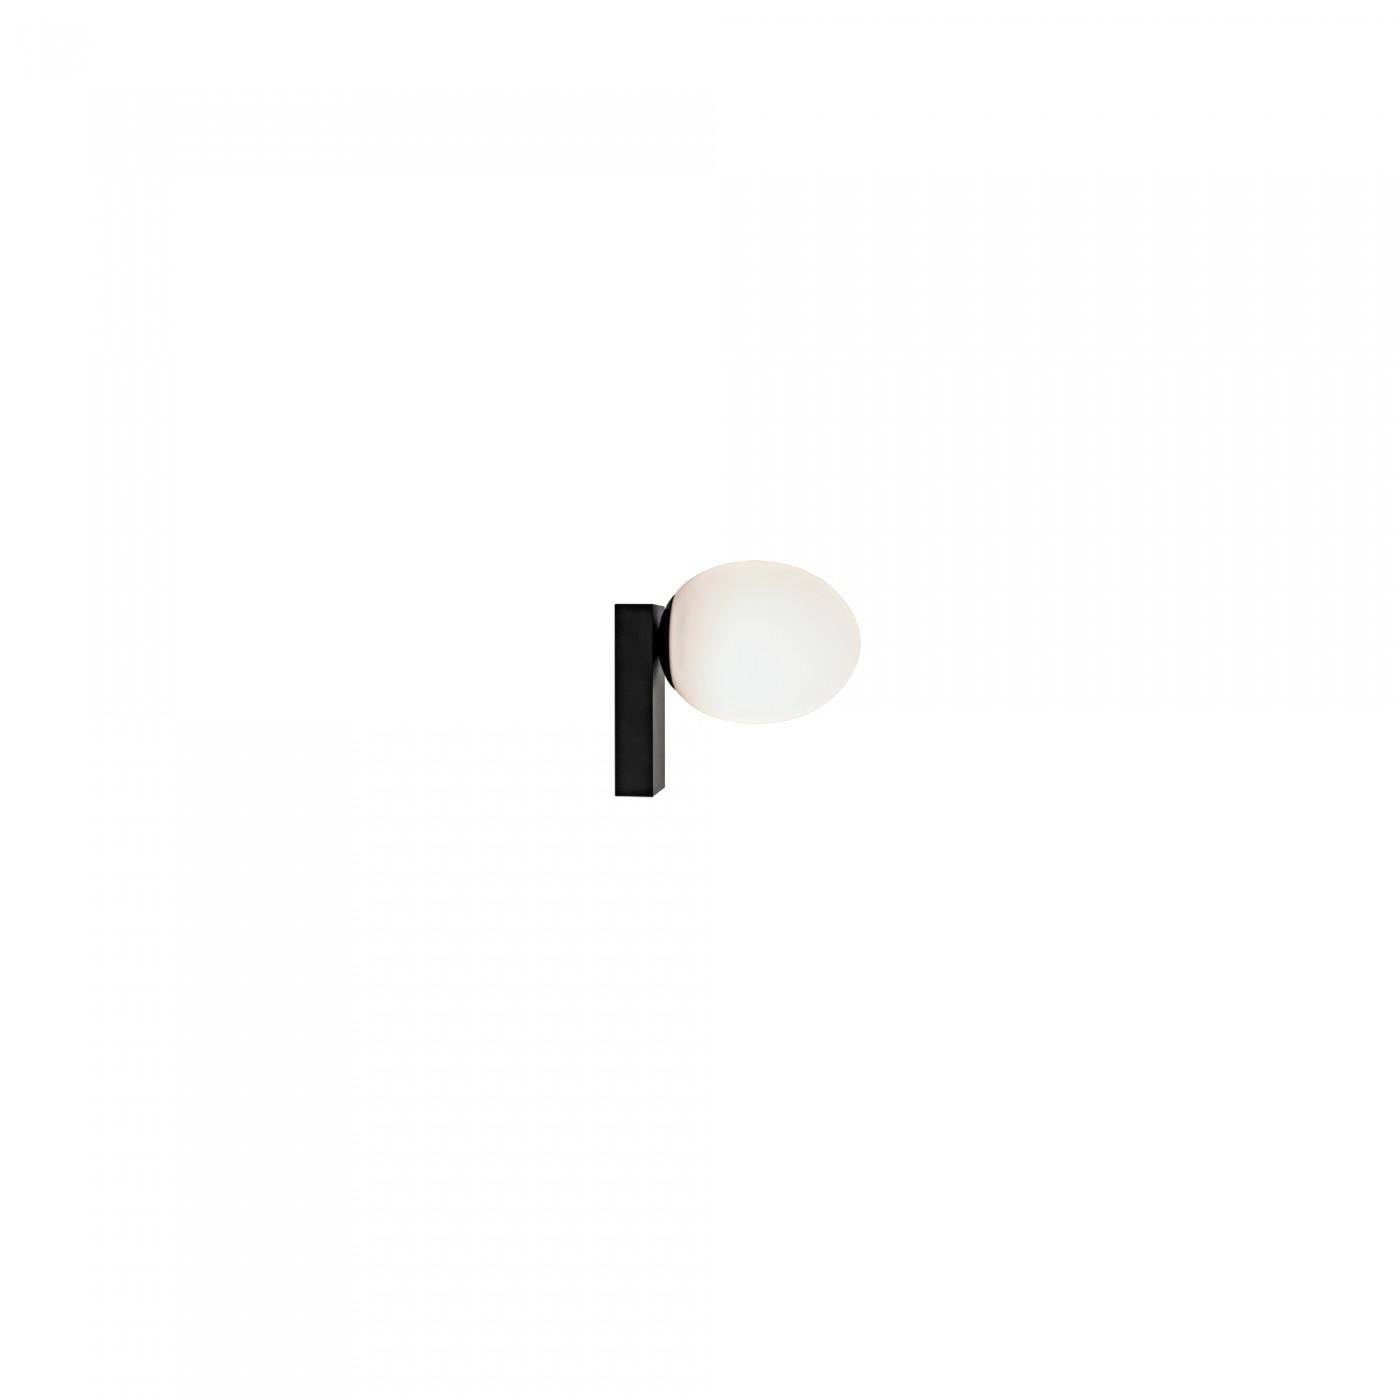 ICE EGG C black 8132 Nowodvorski Lighting